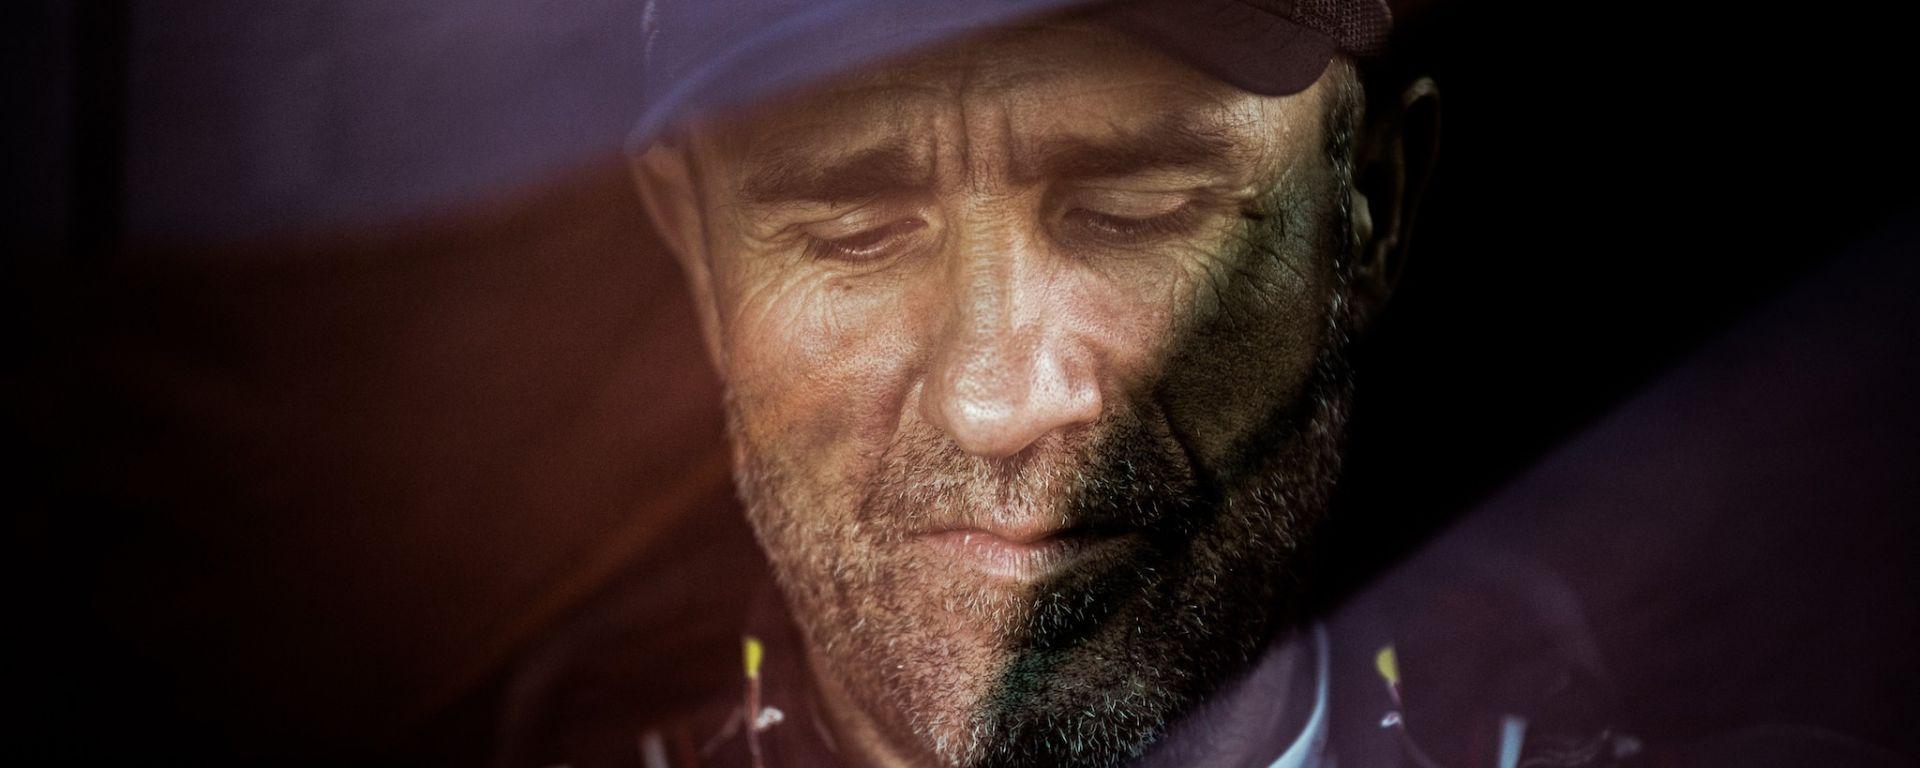 Peugeot Sport Total - il pilota Peterhansel